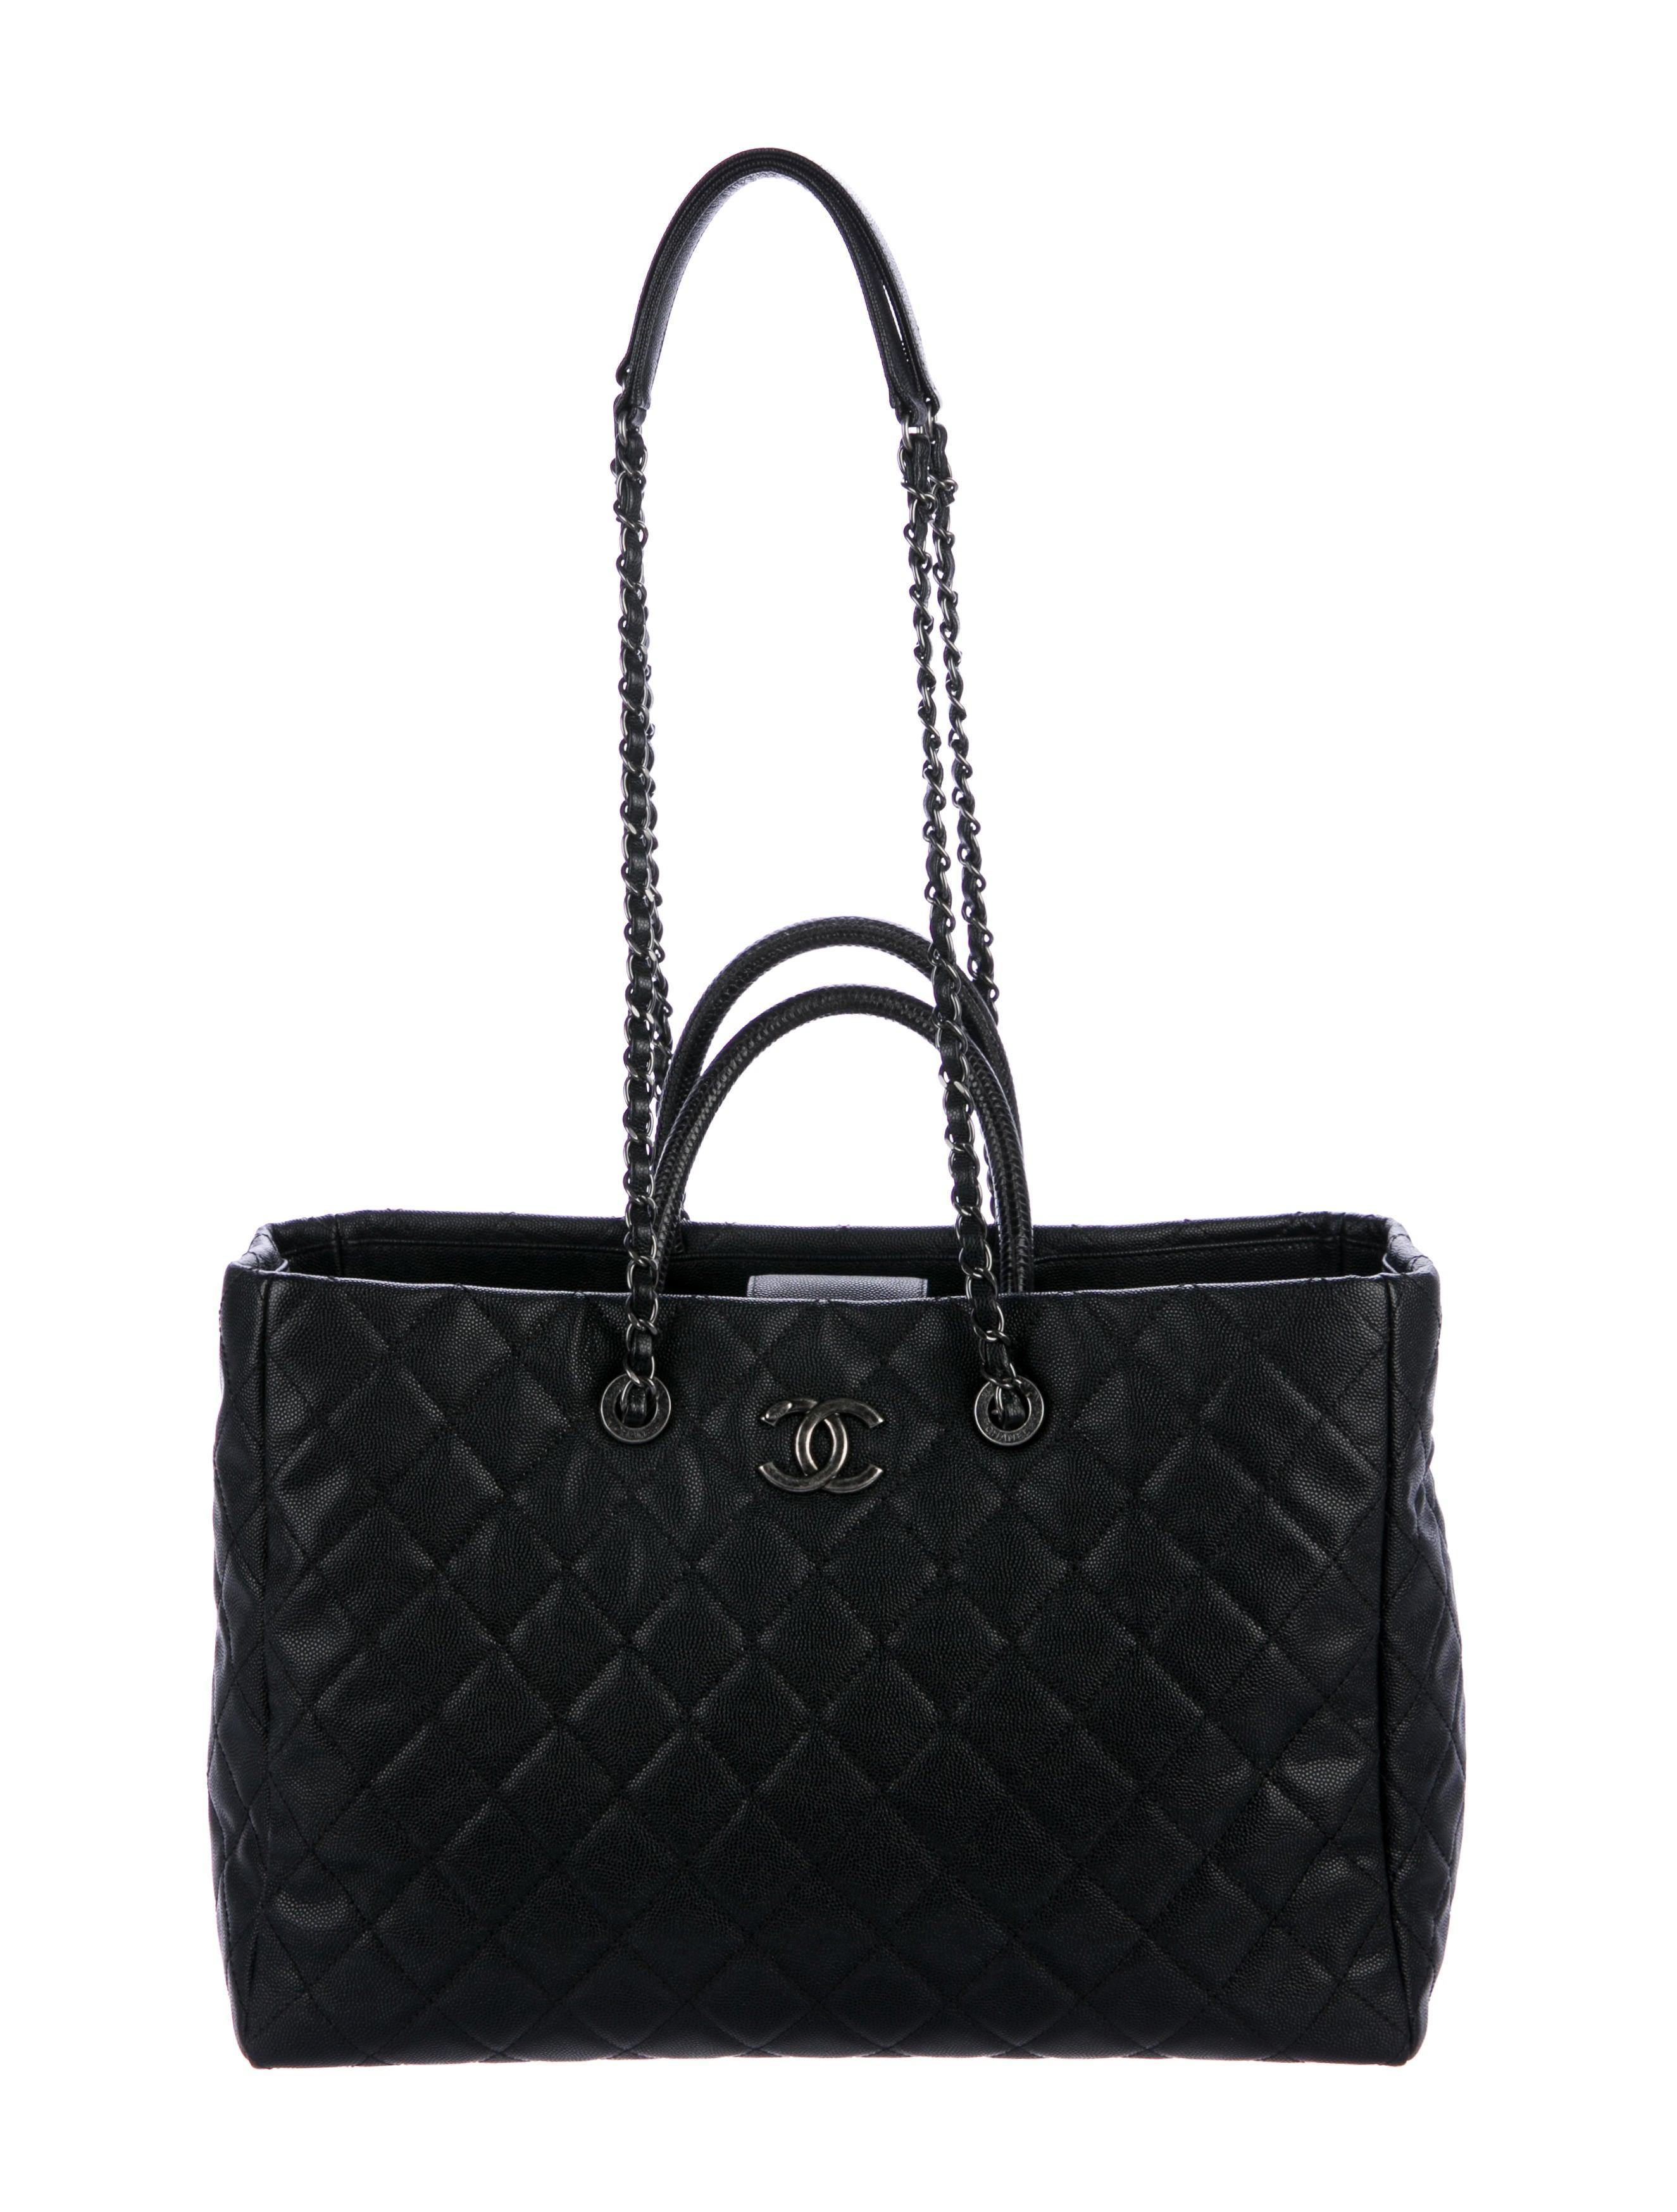 8f5bbcd8d08d Chanel 2017 Lizard-Trimmed Coco Handle Tote - Handbags - CHA239041 ...